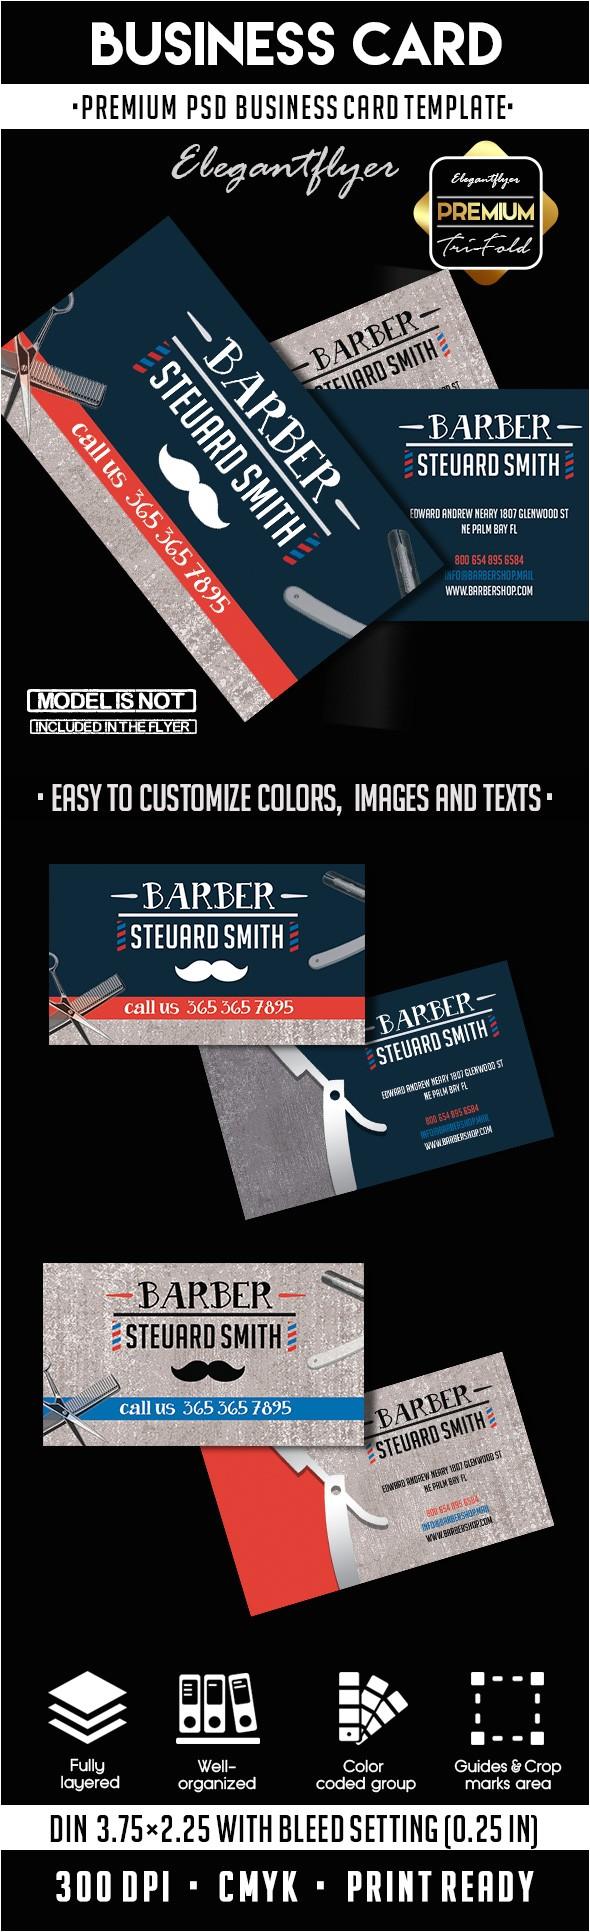 barber shop premium business card psd template